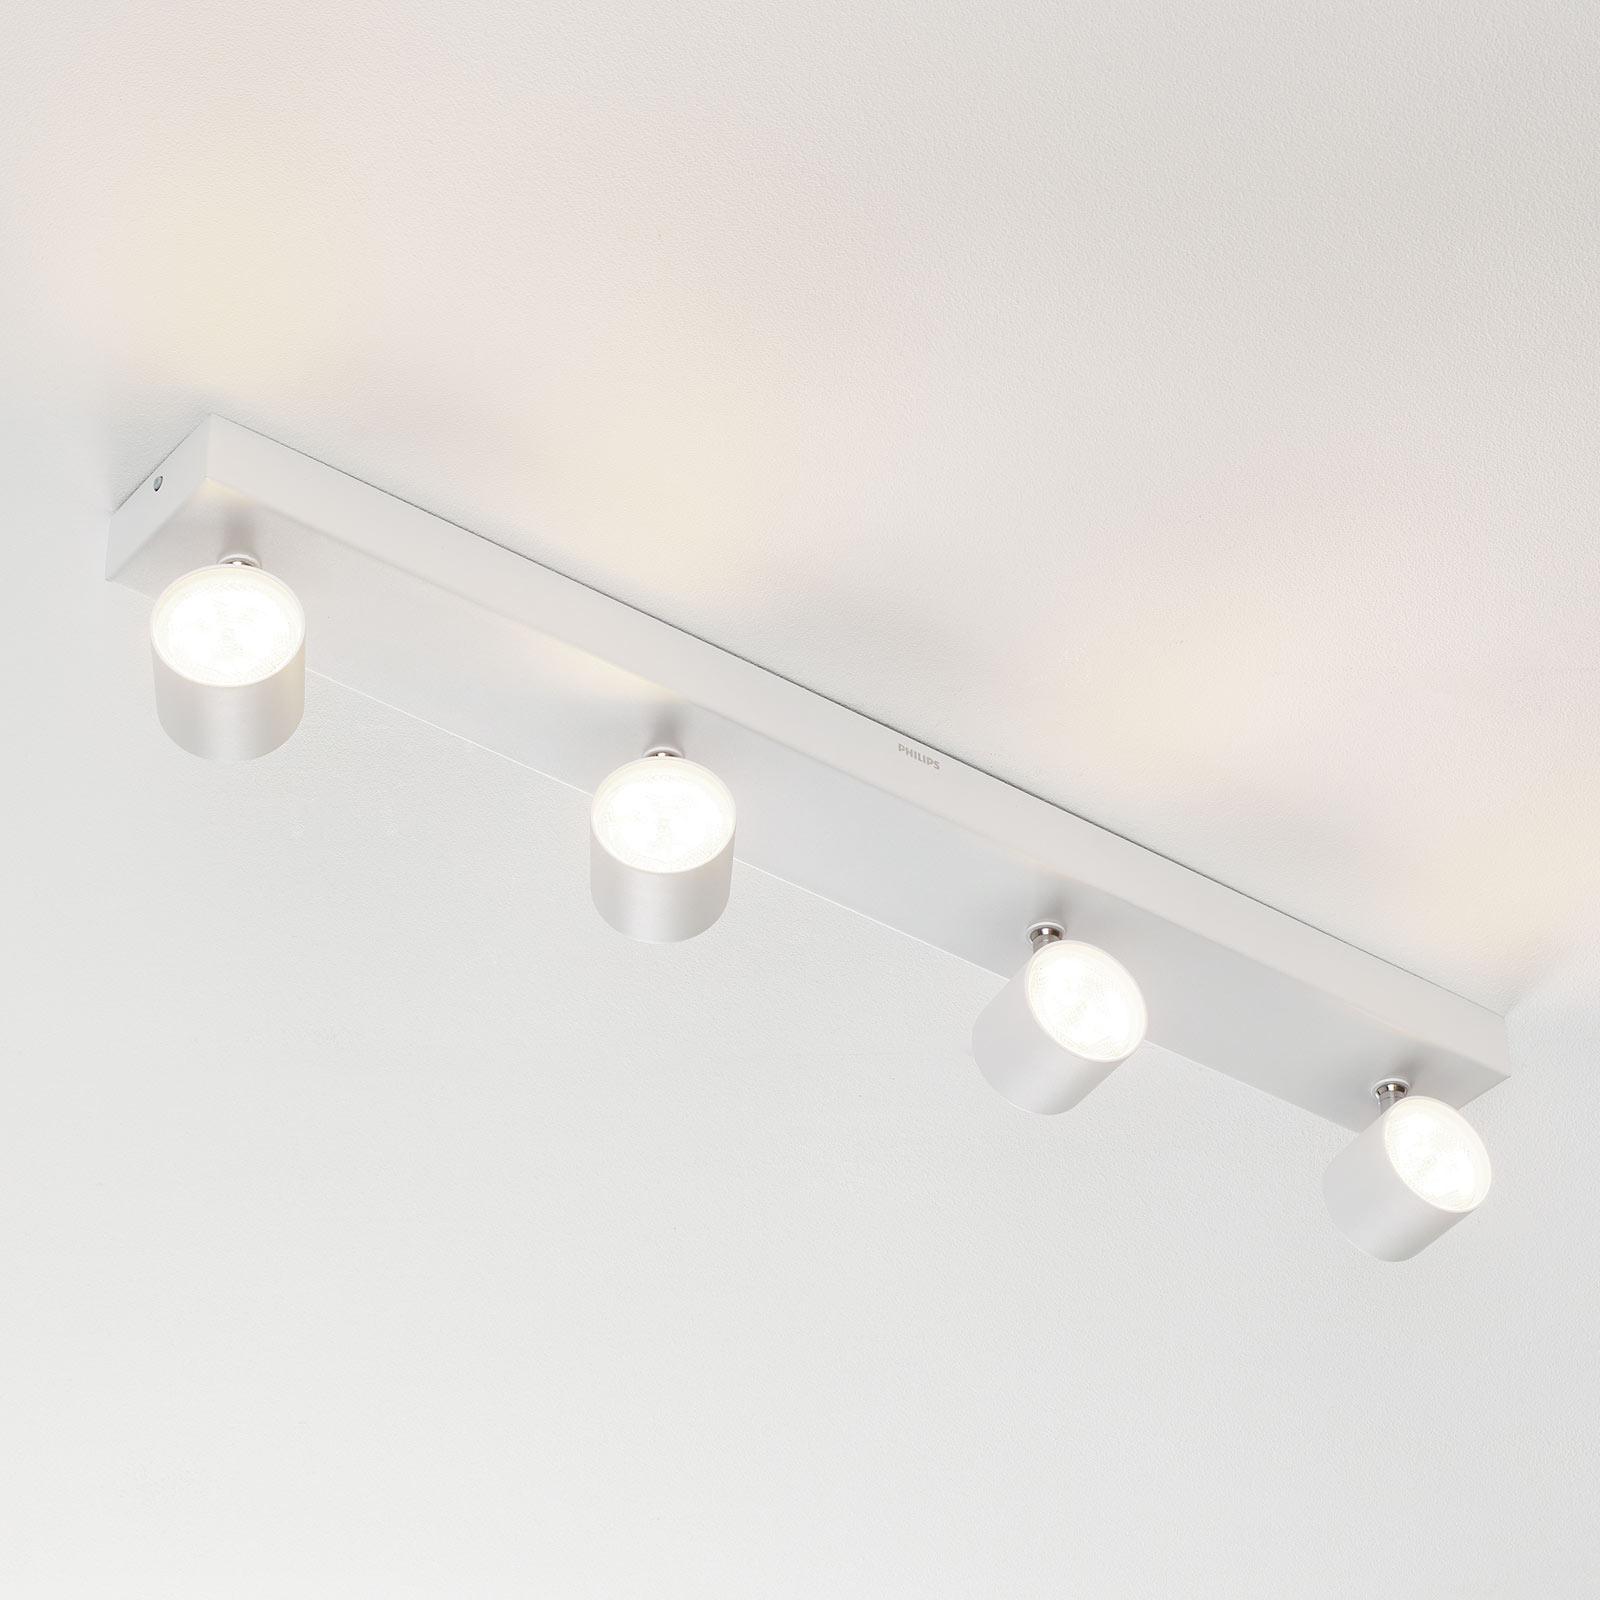 Philips Star LED-Strahler weiß 4flg. WarmGlow